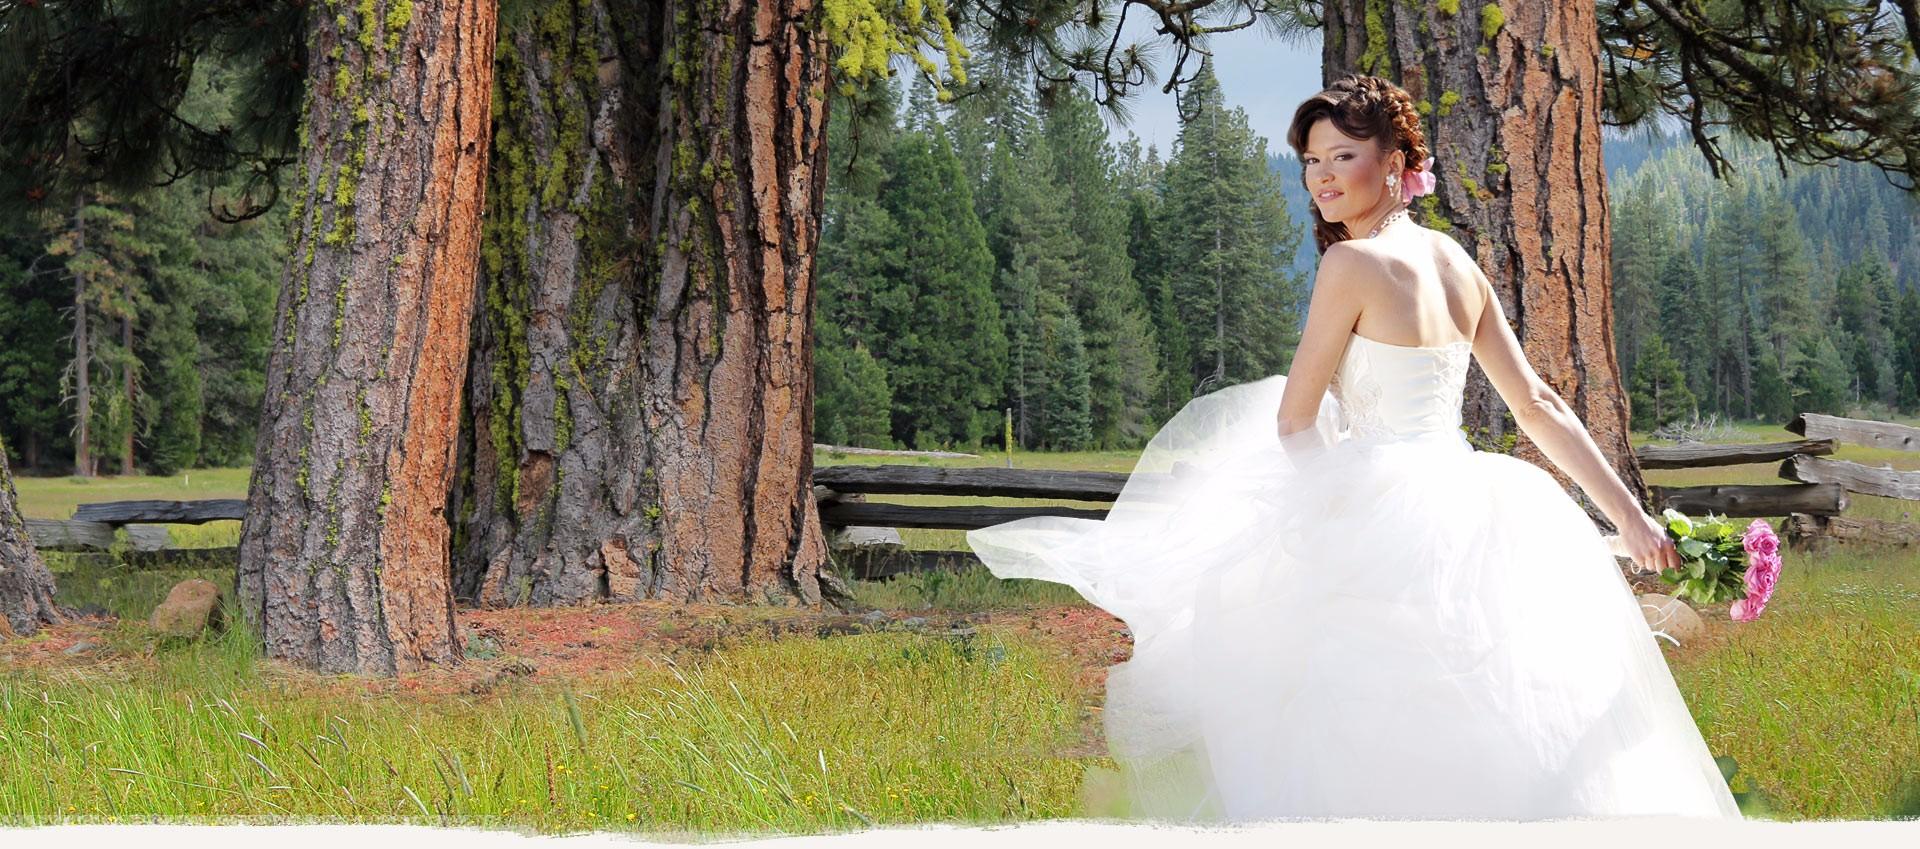 High_wedding